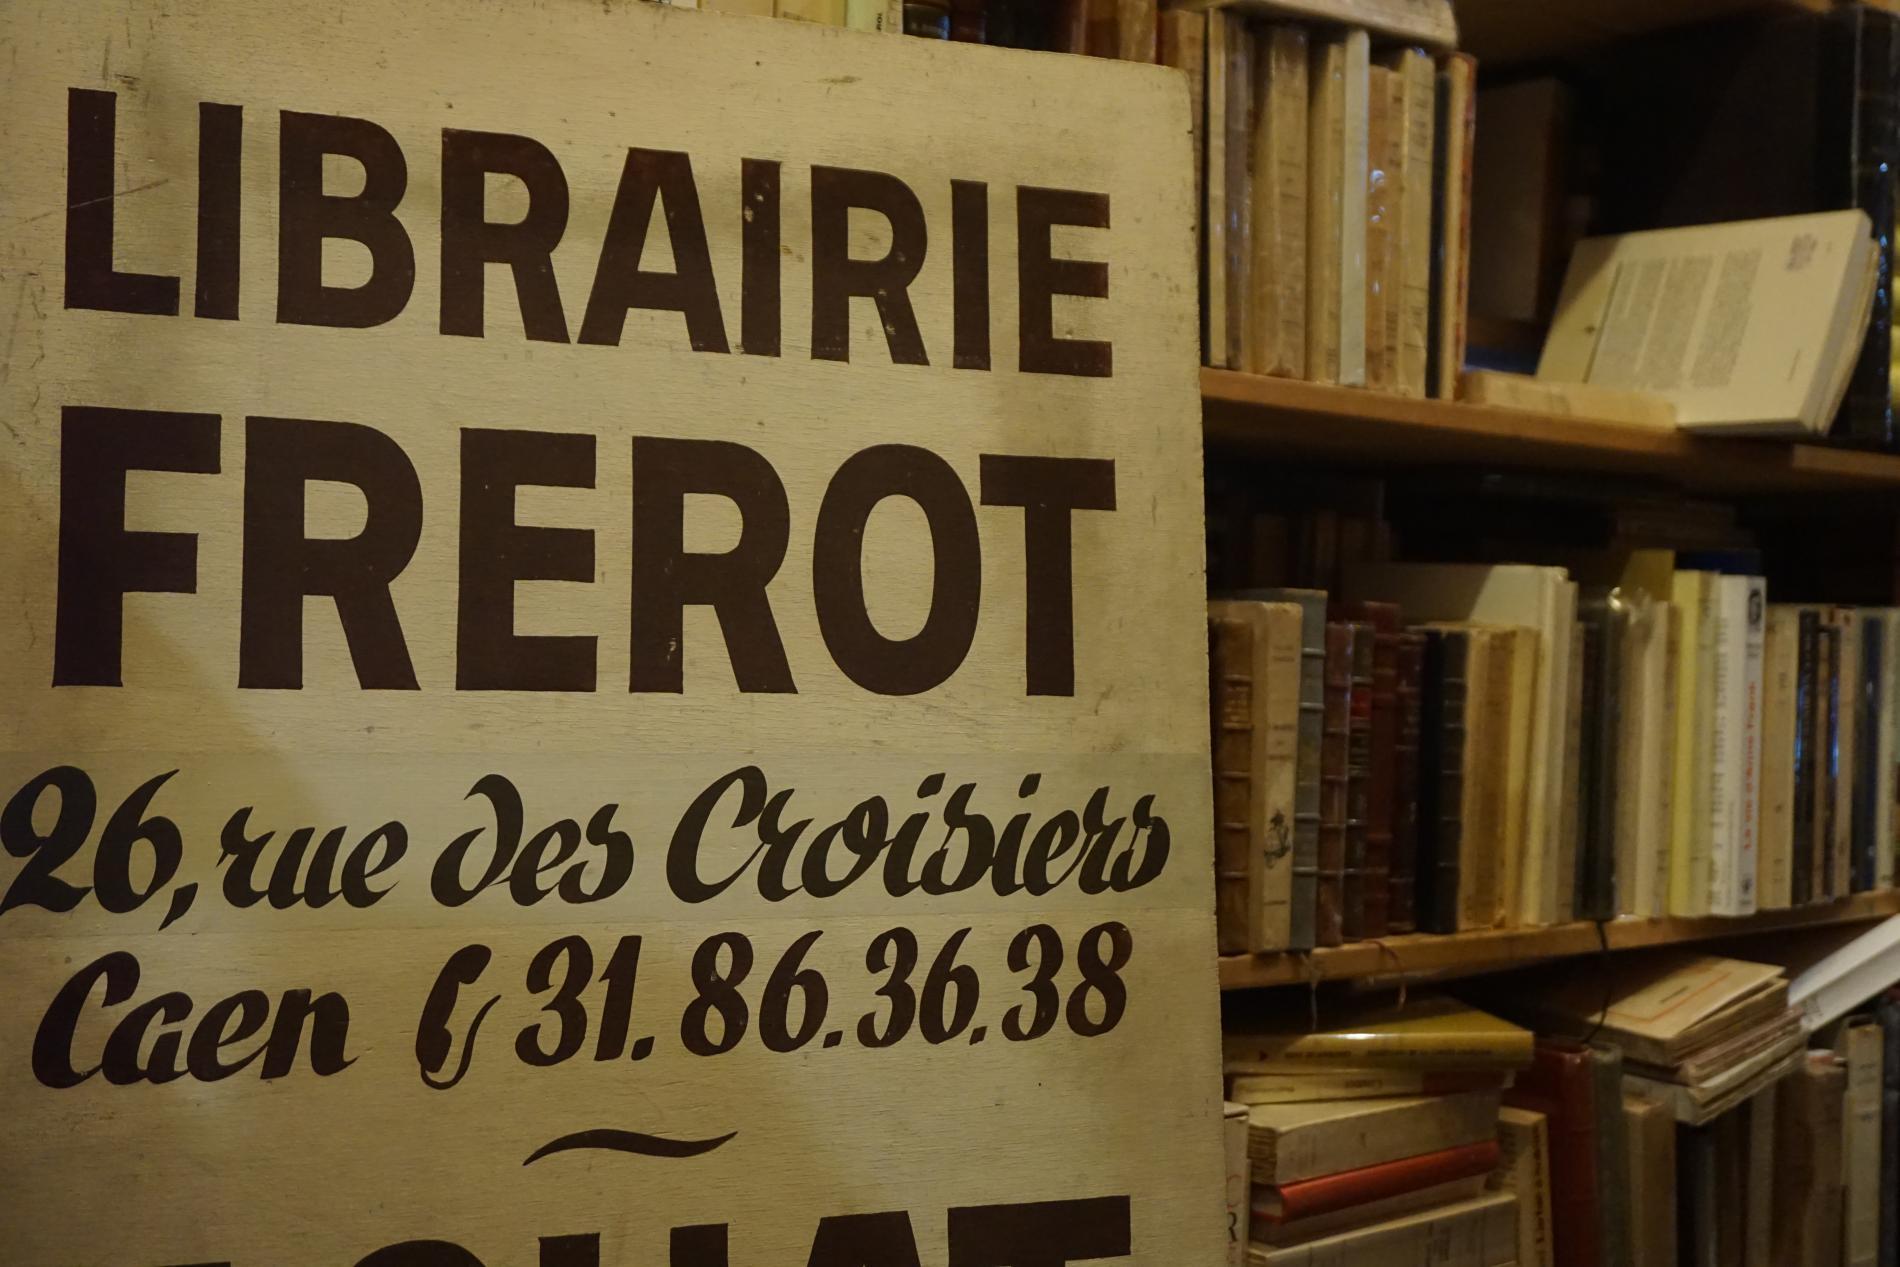 FREROT BOOKSHOP